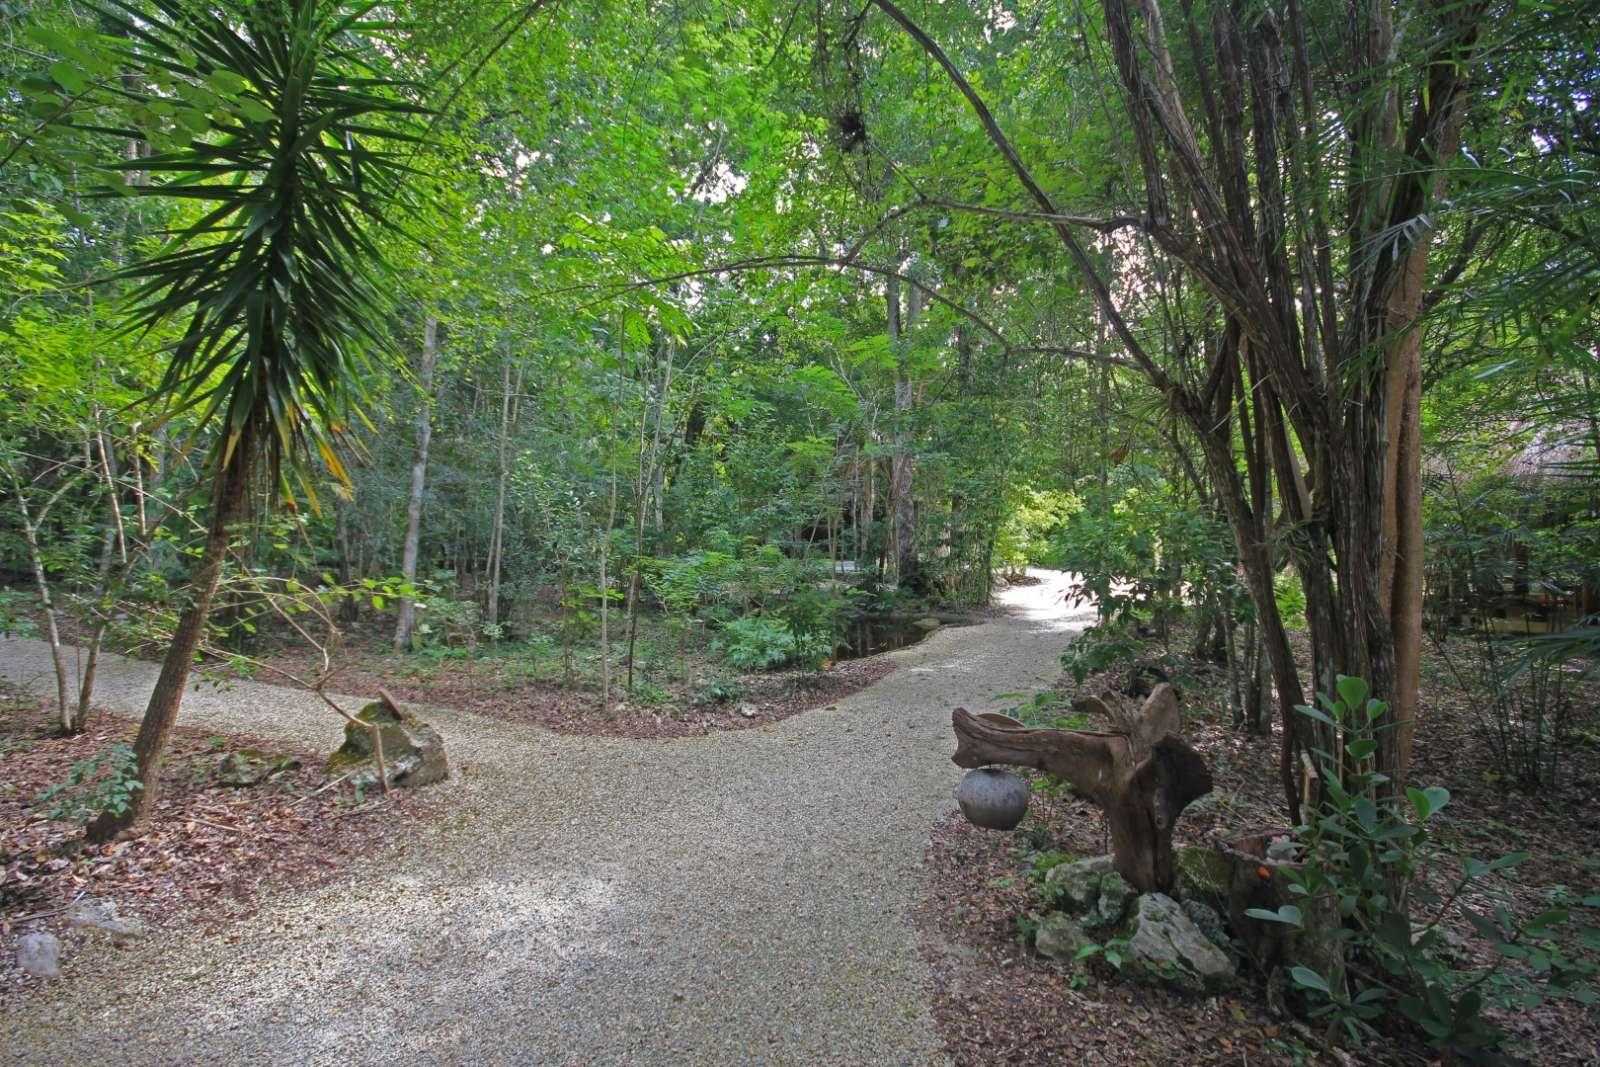 Pathway at Hotel Puerta Calakmul